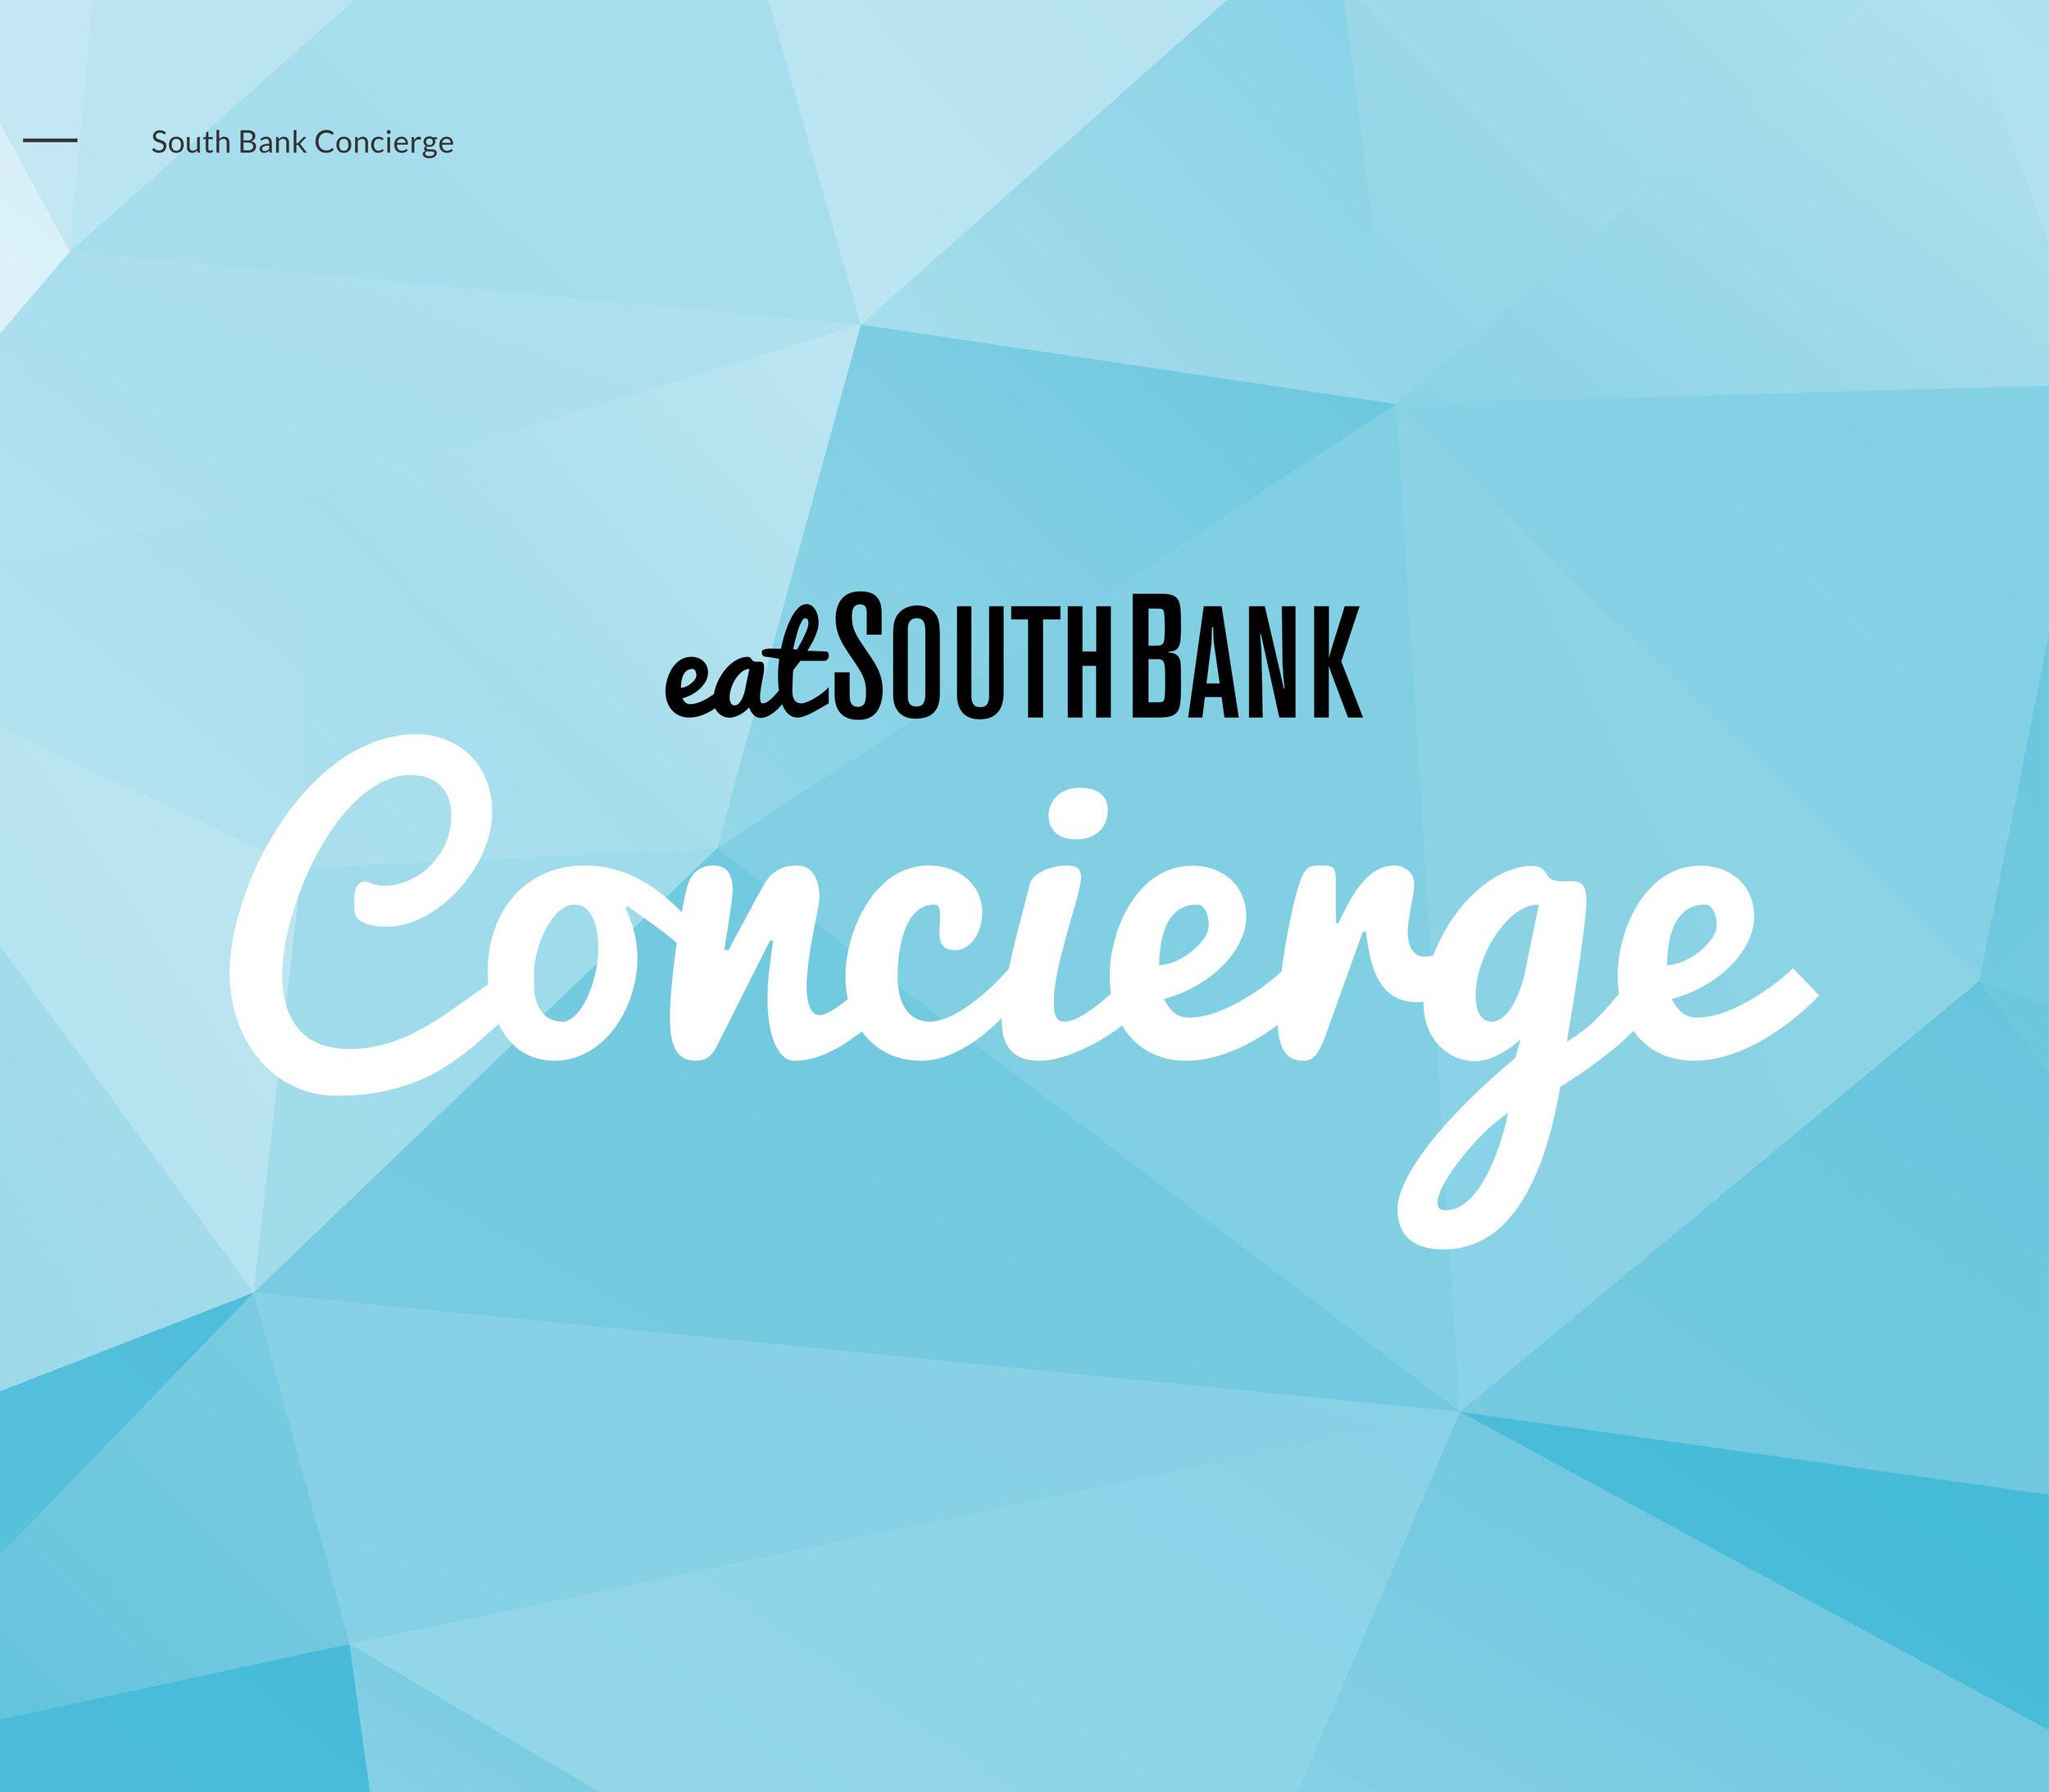 SB55-PORTFOLIO-SouthBankConcierge_v3_1.jpg